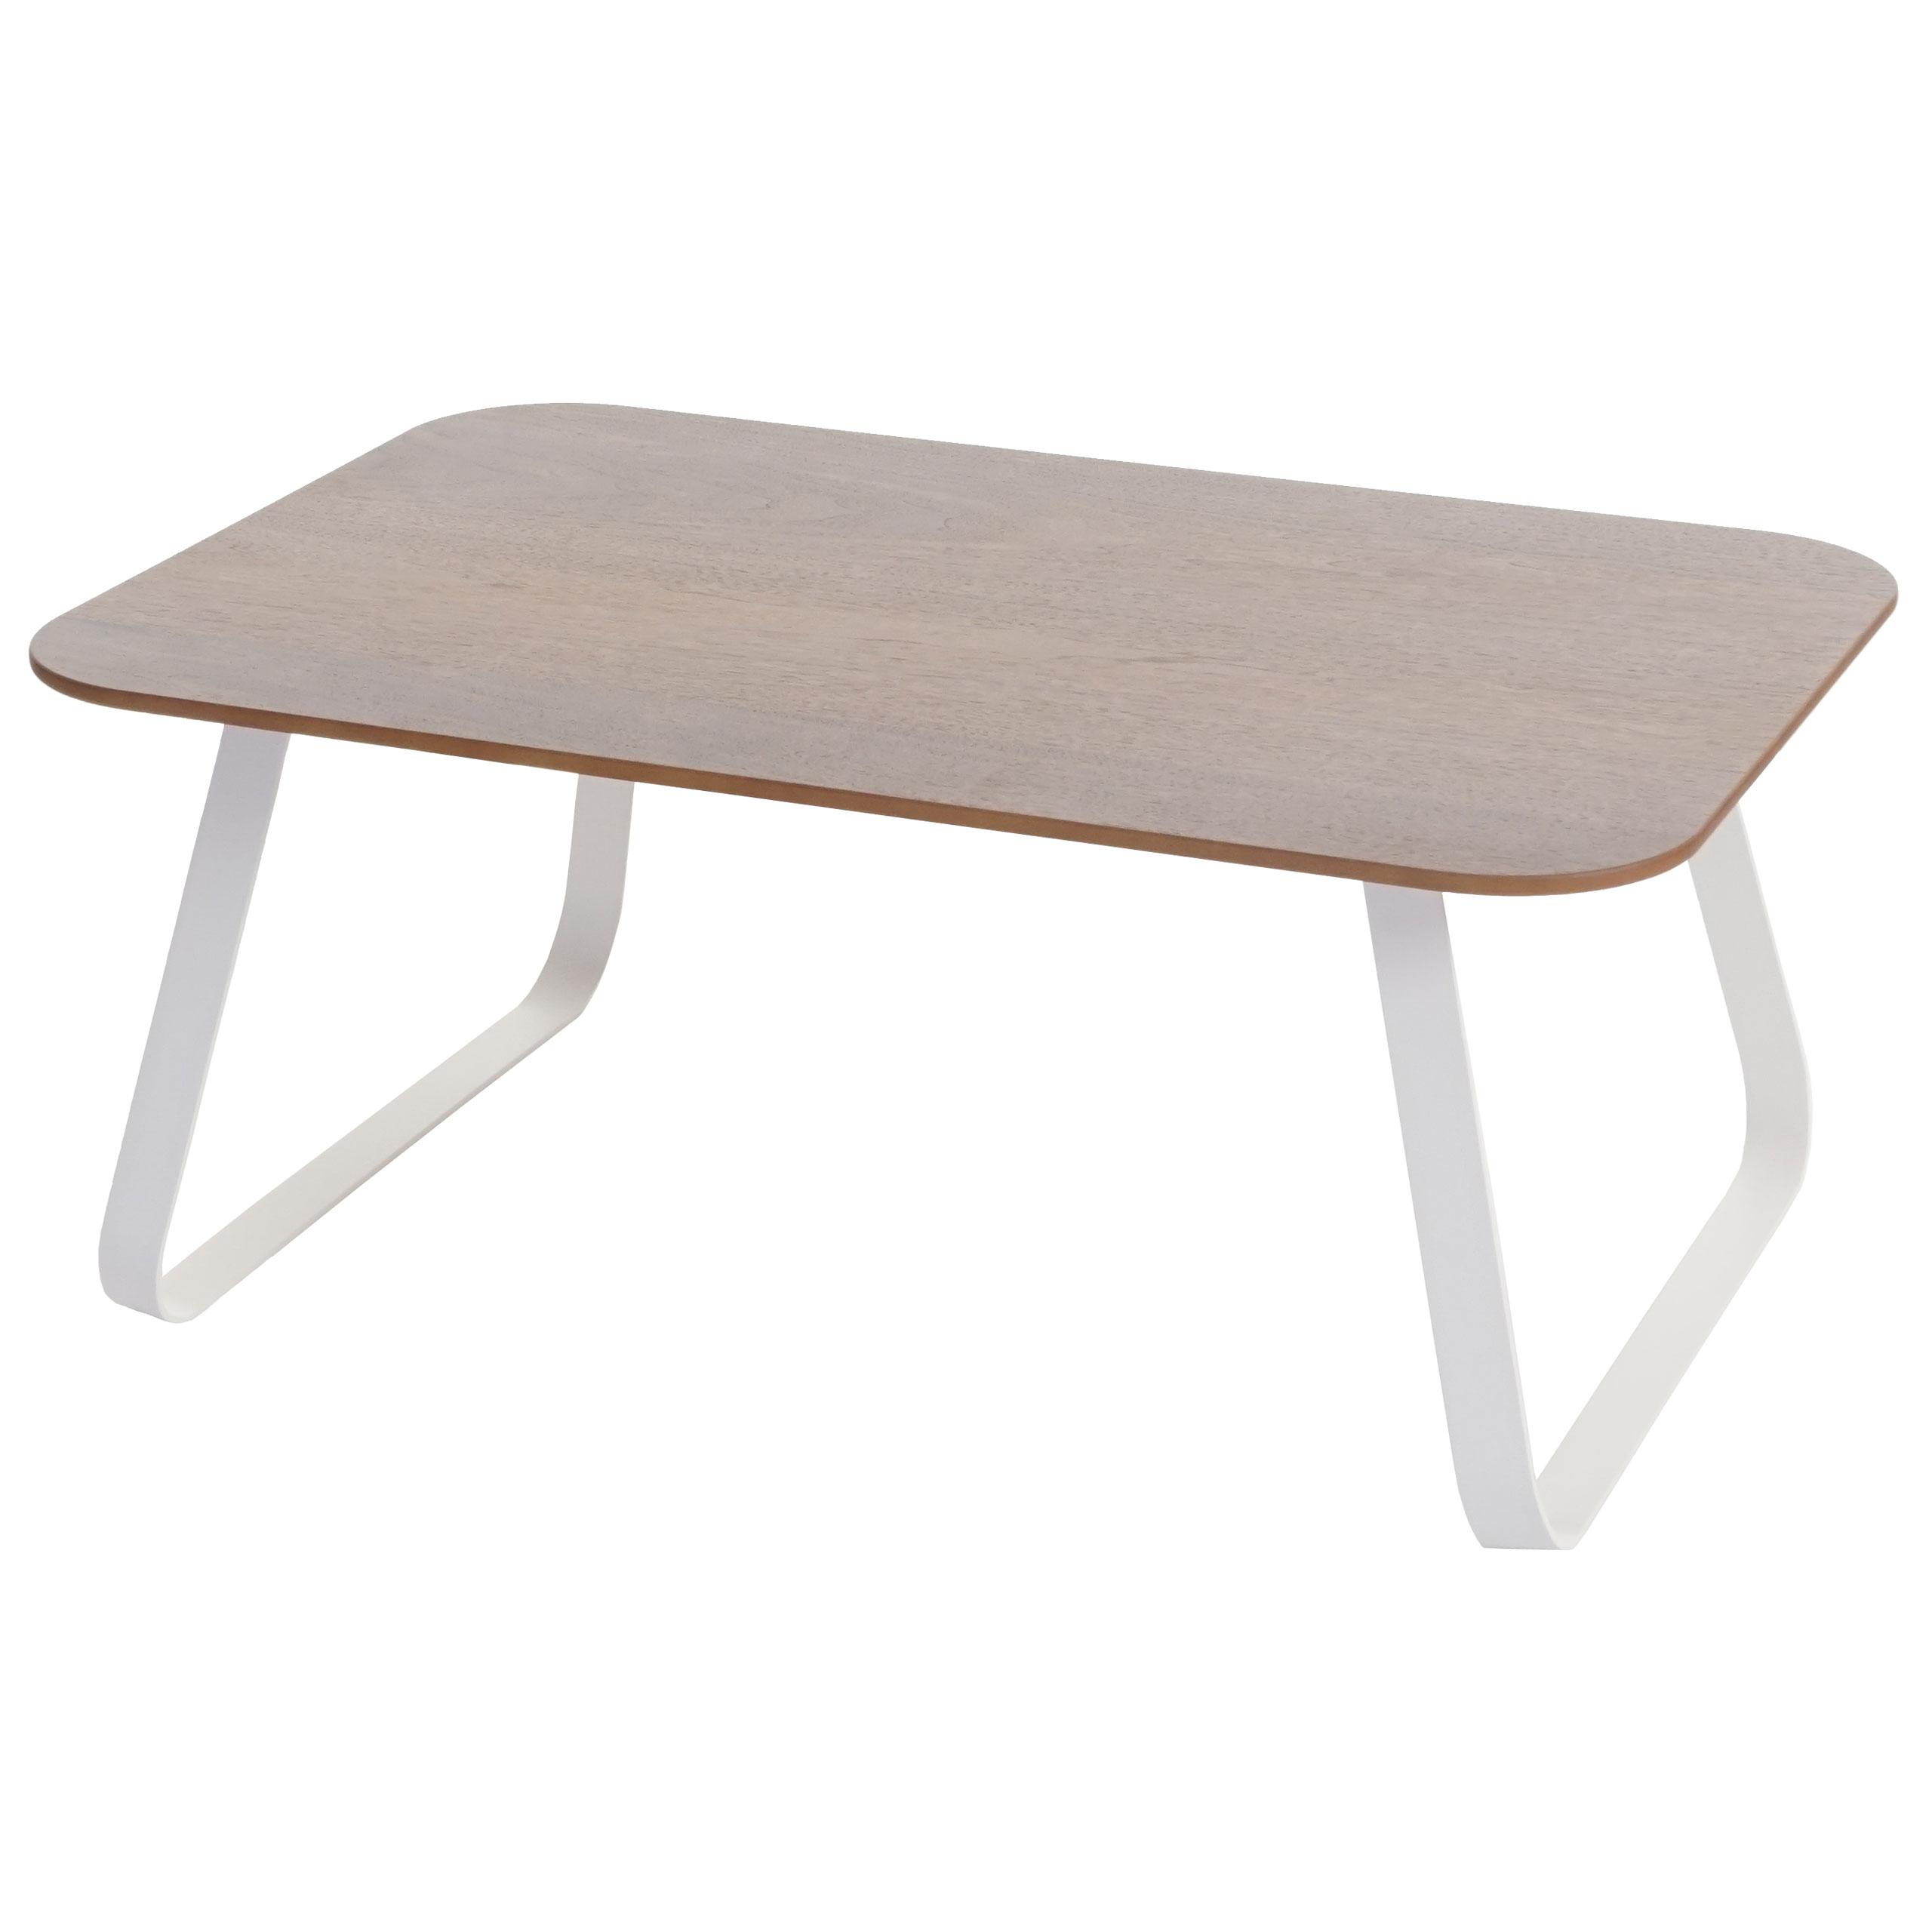 Tavolino tavolo da salotto mecheln rettangolare 60x90x38cm for Wohnzimmertisch noce